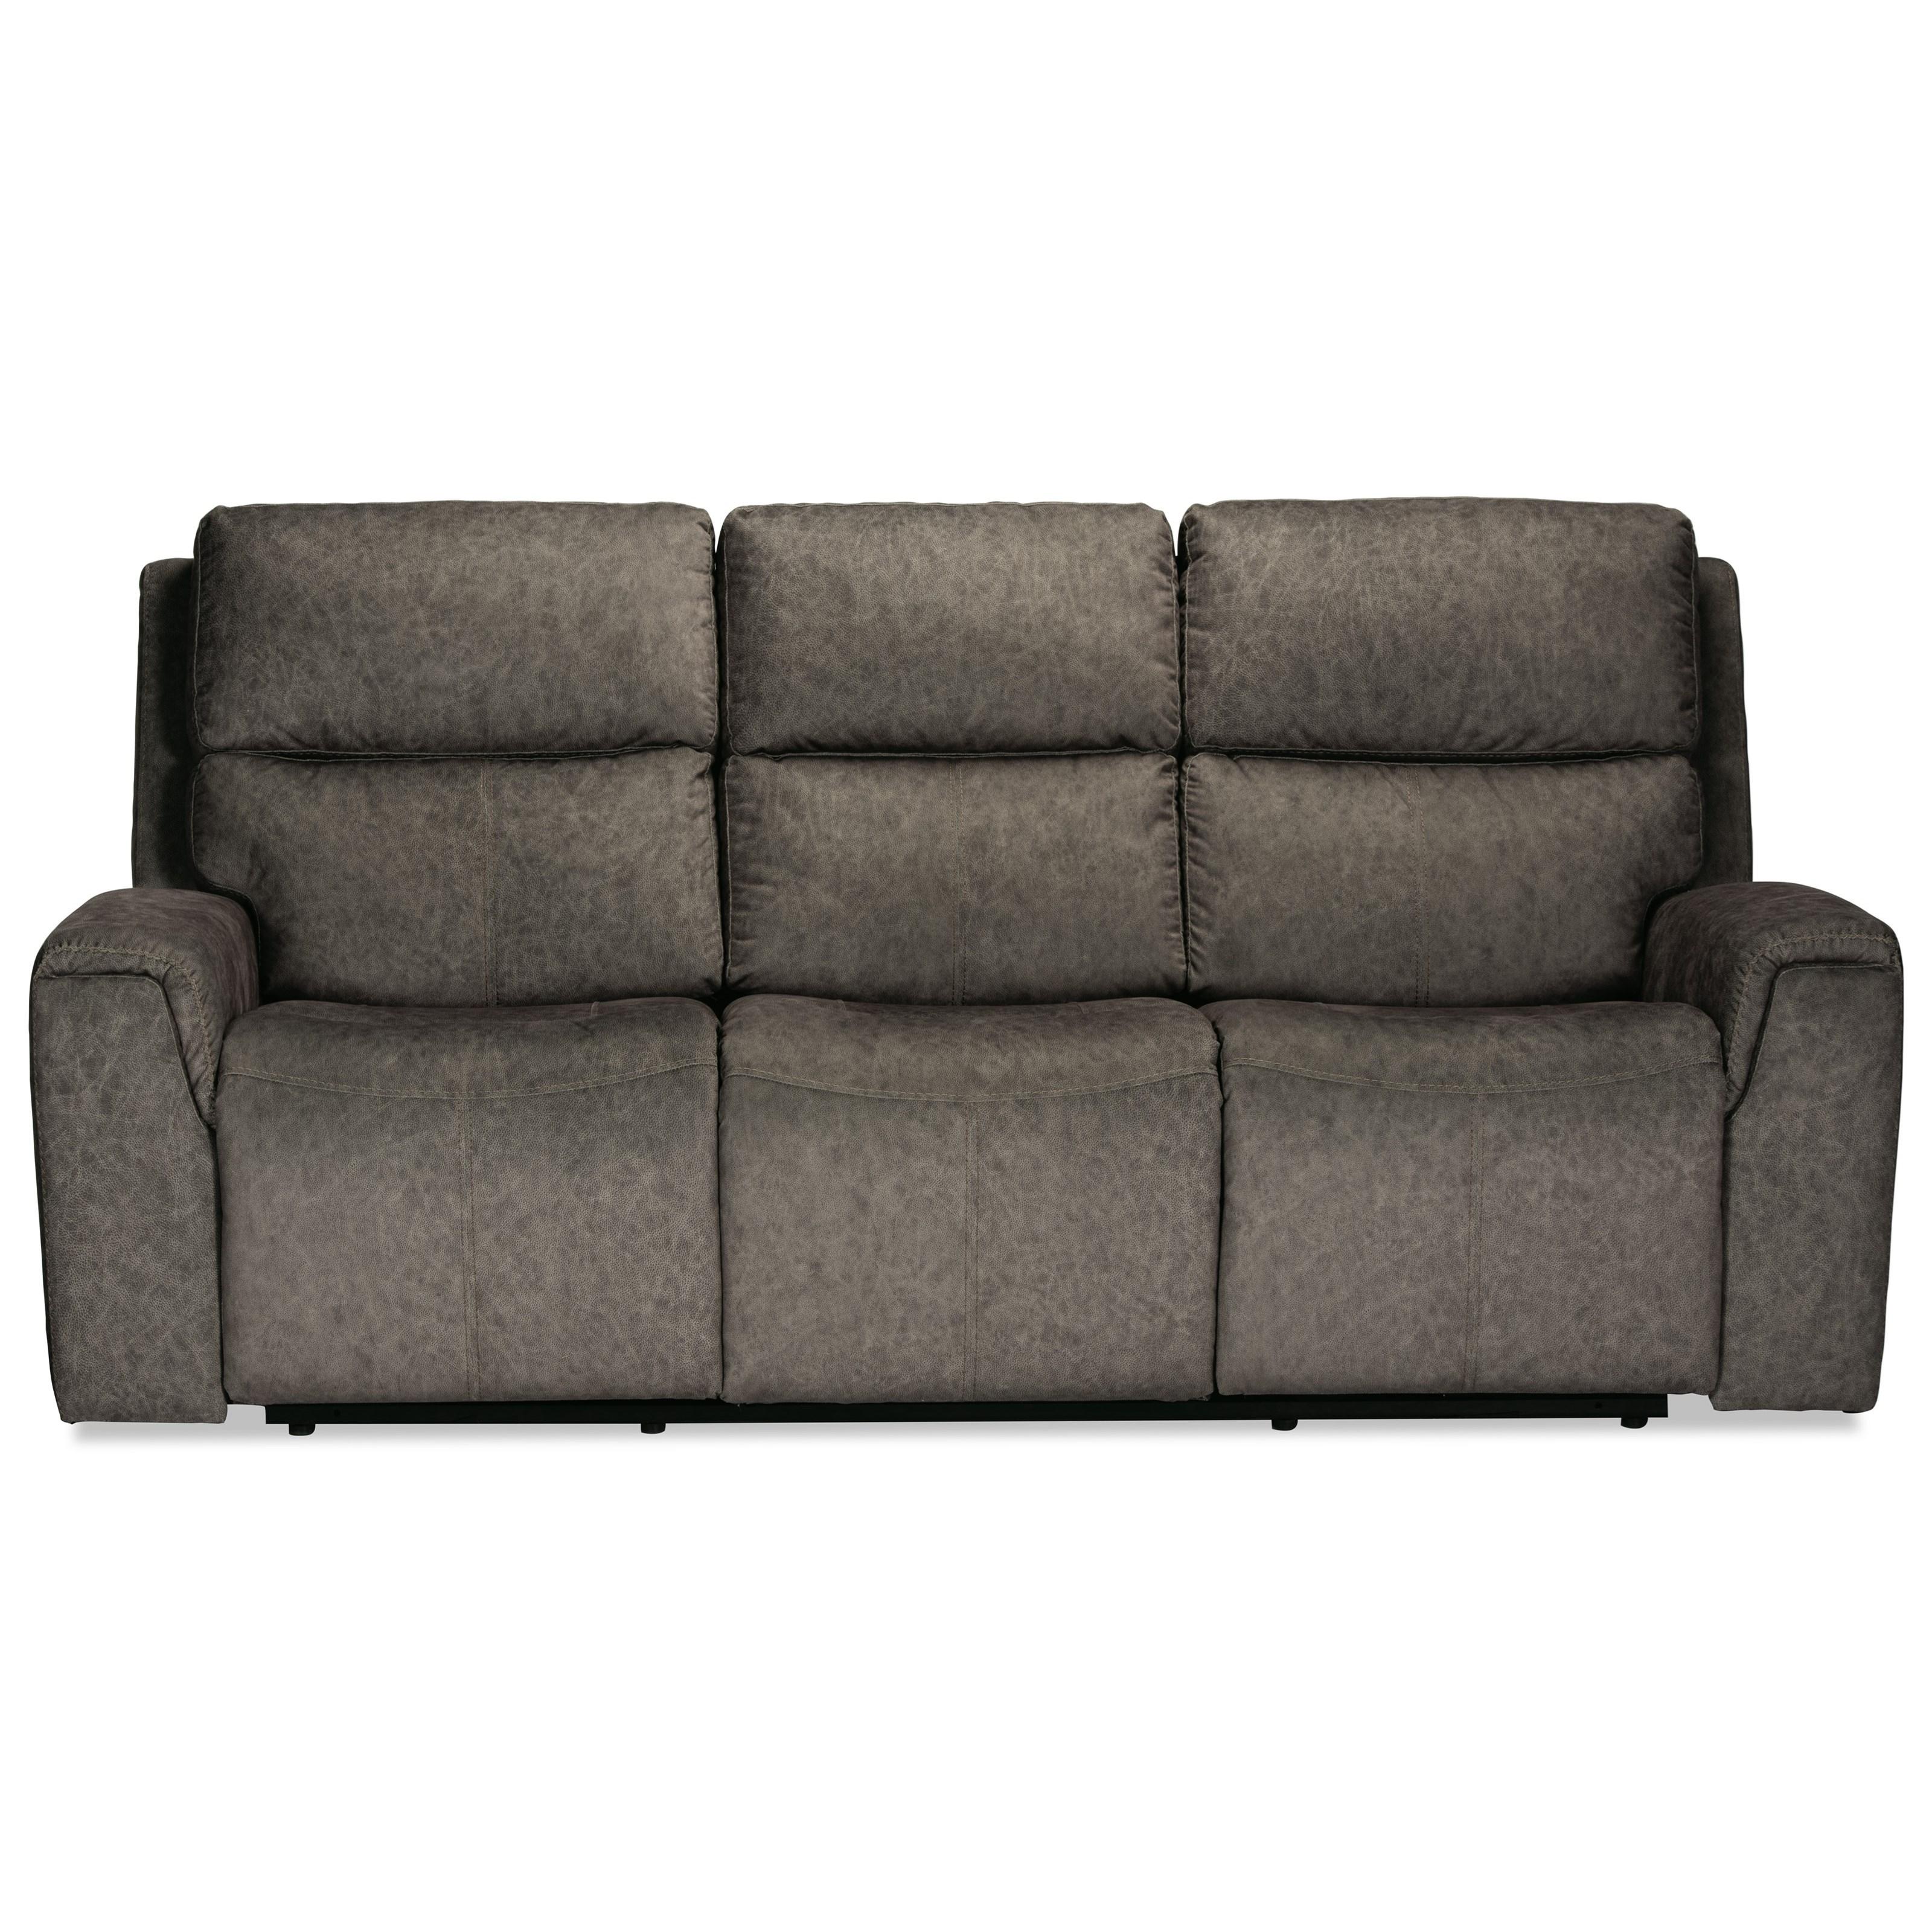 Latitudes - Jarvis Power Reclining Sofa by Flexsteel at Walker's Furniture